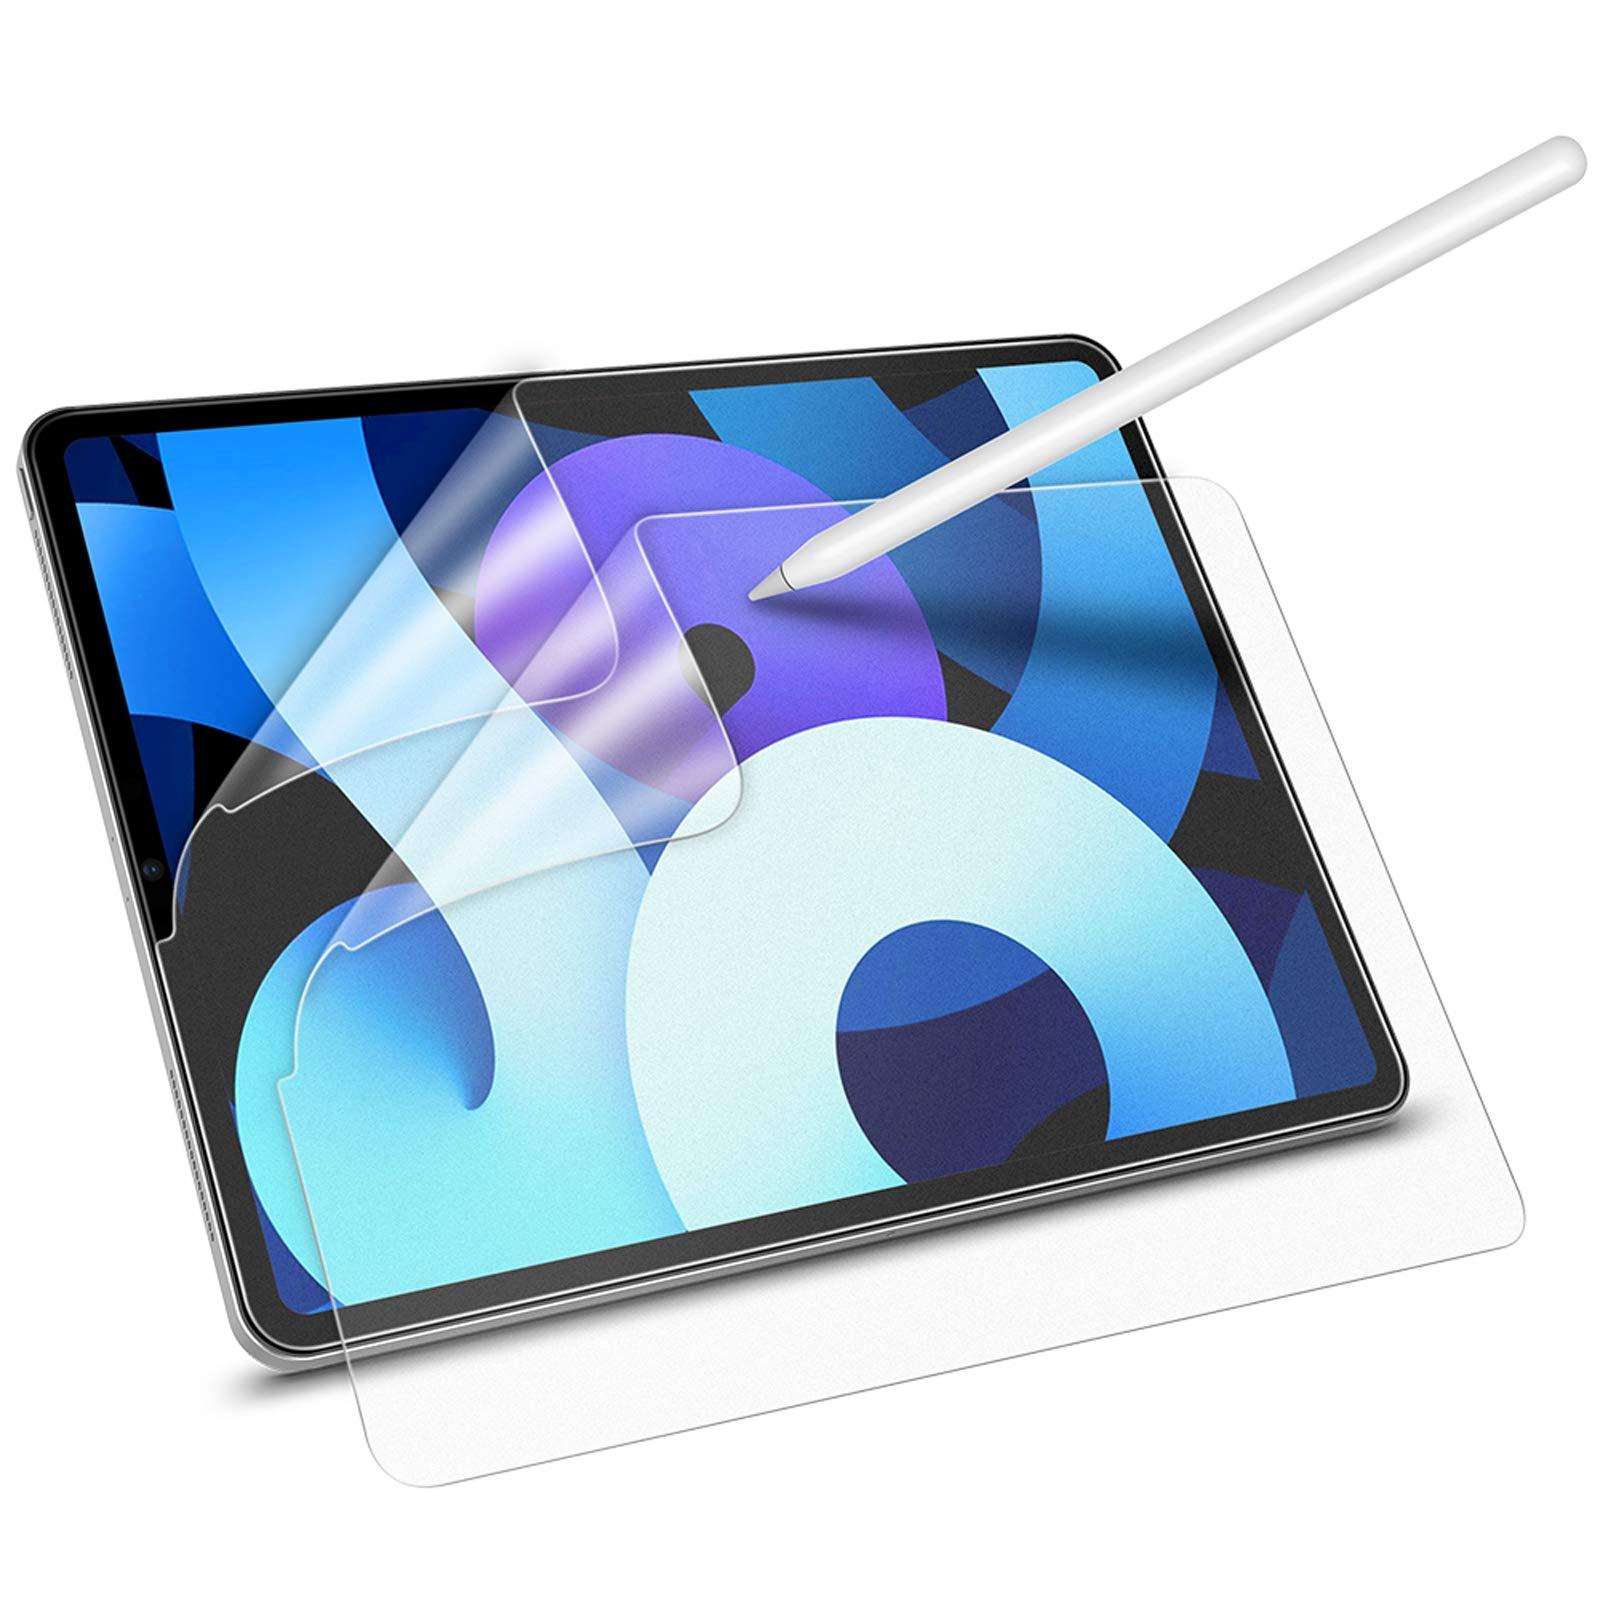 MoKo 2 Pack Like Paper Screen Protector Fit iPad Air 4th Generation 2020 New iPad 10.9 in 2020 Anti-Scratch Anti-Glare Bubble-Free PET Film Support Apple Pencil Matte iPad Pro 11 2018//2020